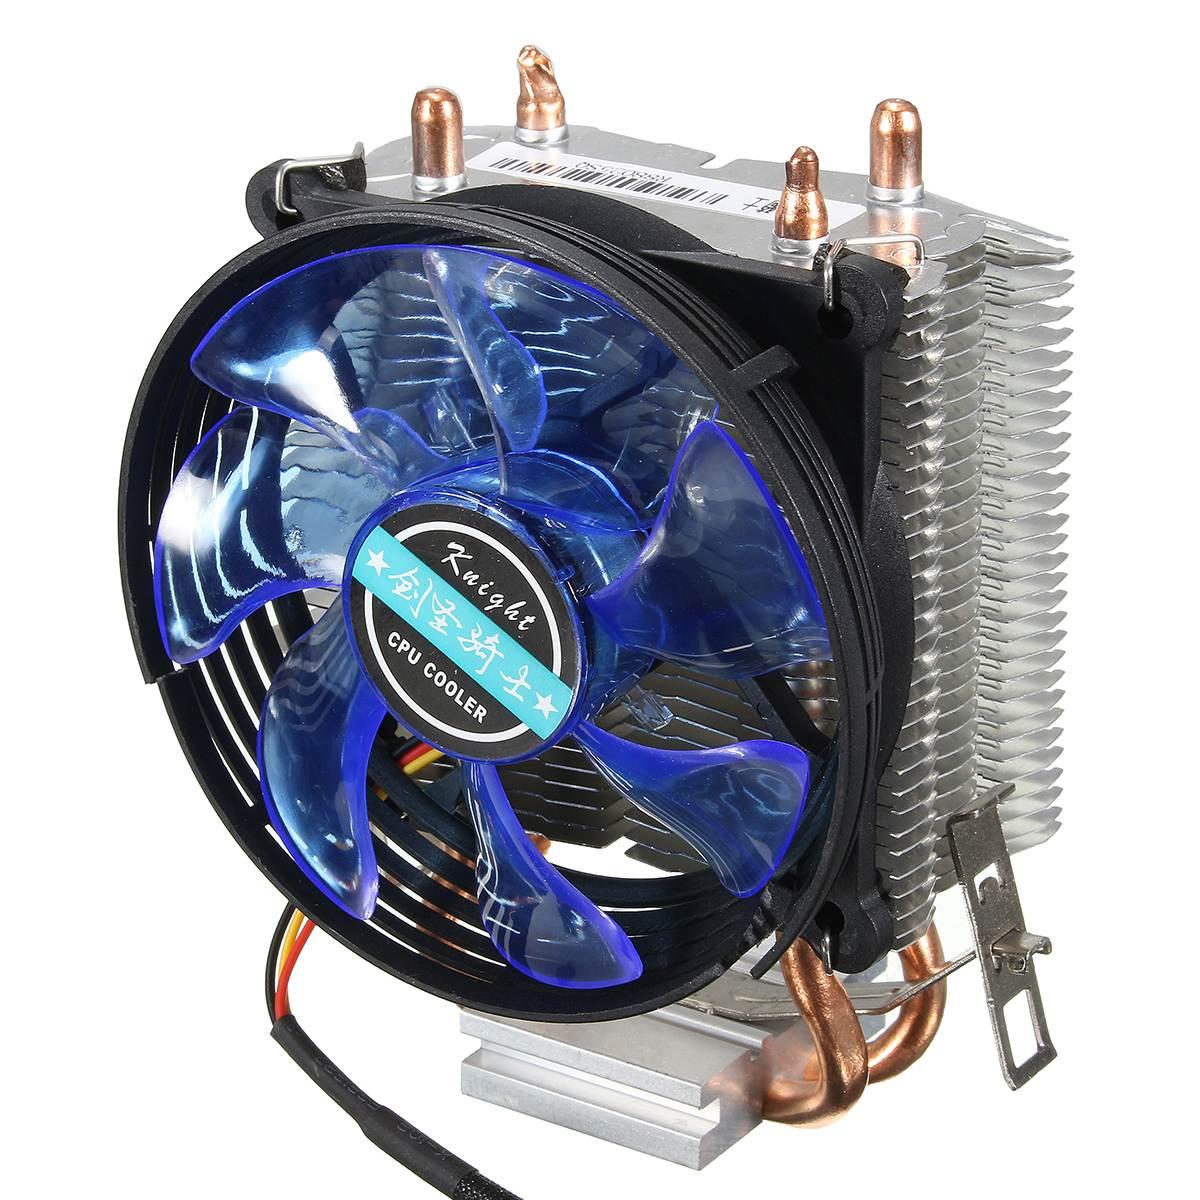 95x95x25mm LED Cooler Cpu Fan Heatsink Copper for Intel LGA775/1156/1155 for AMD AM2/AM2+/AM3 New Computer Cooling Fan For CPU